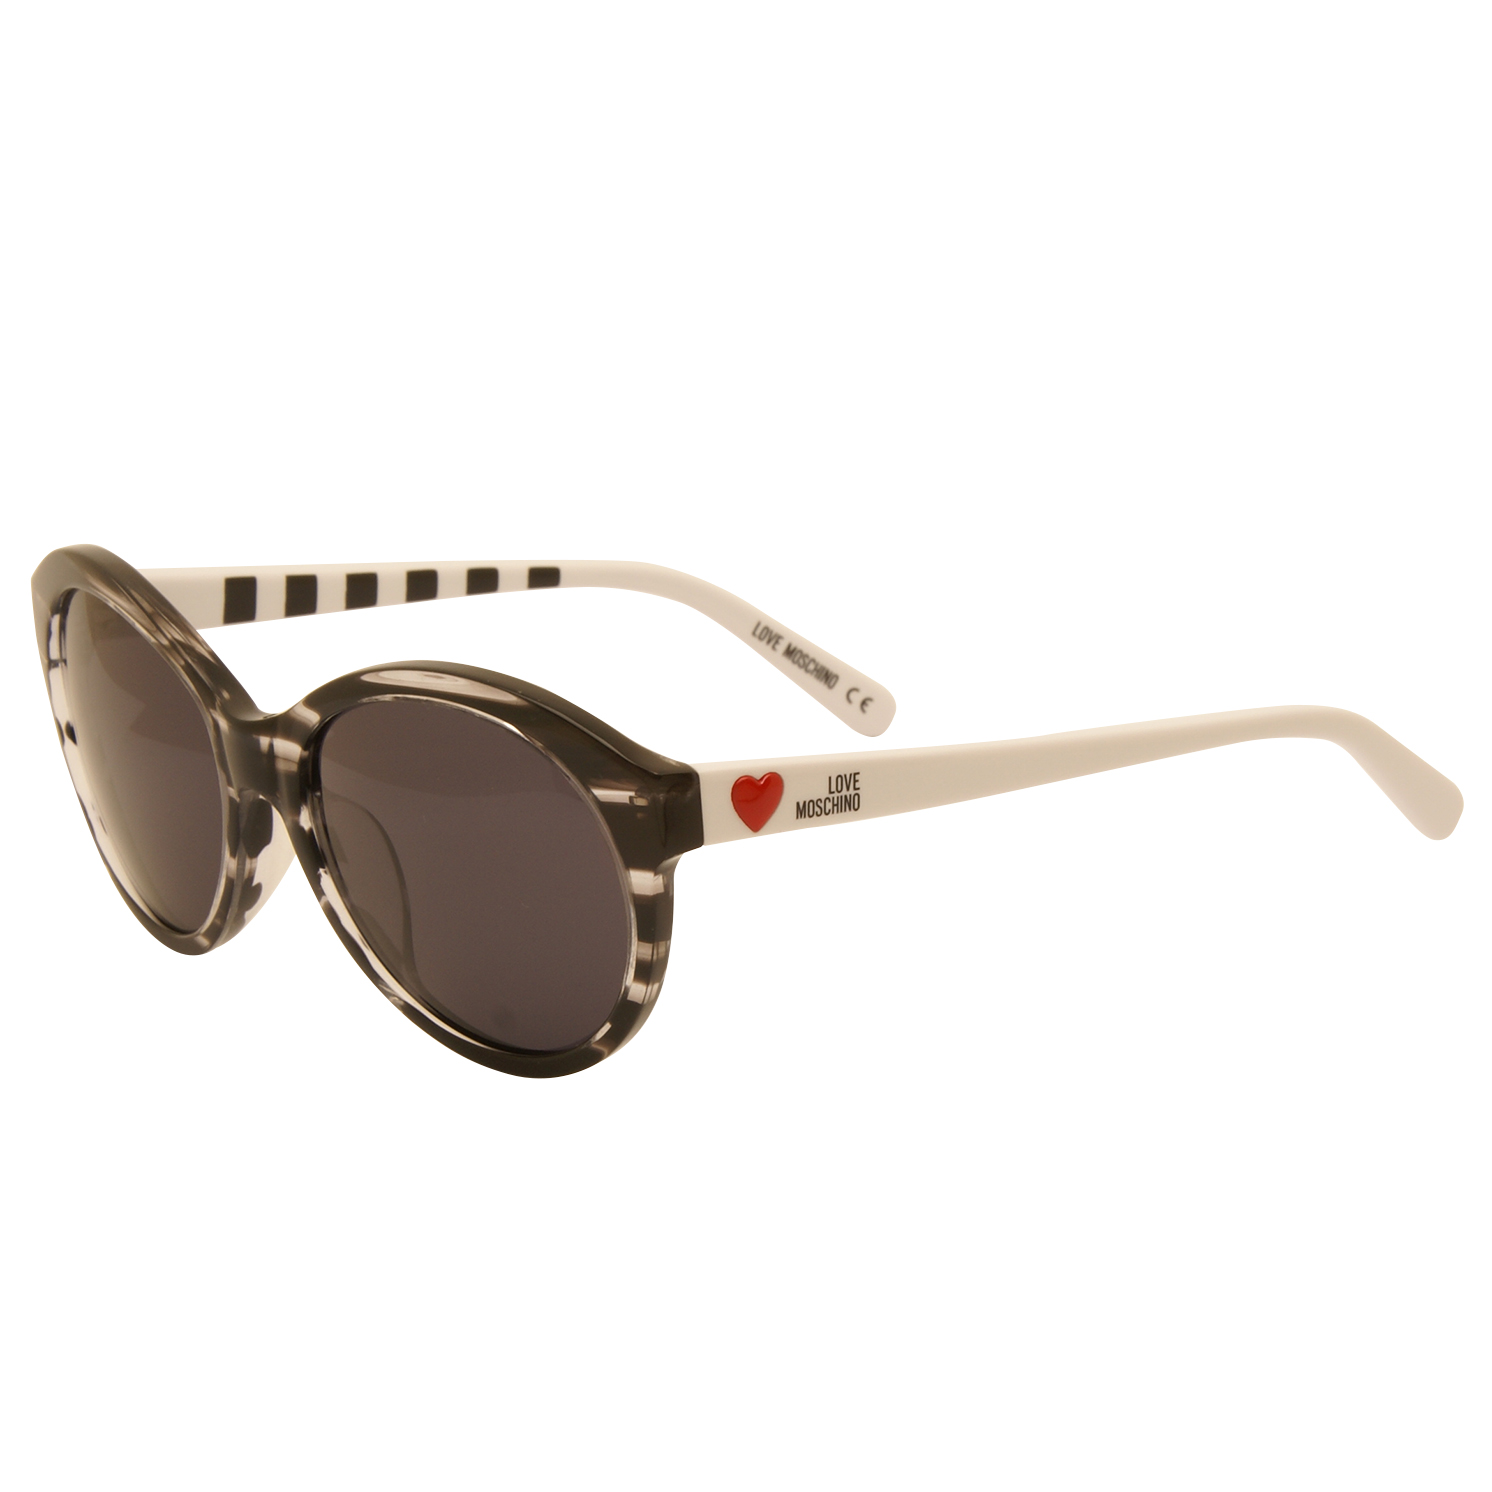 Love Moschino – Black & White Tortoiseshell Classic Style Sunglasses with Case